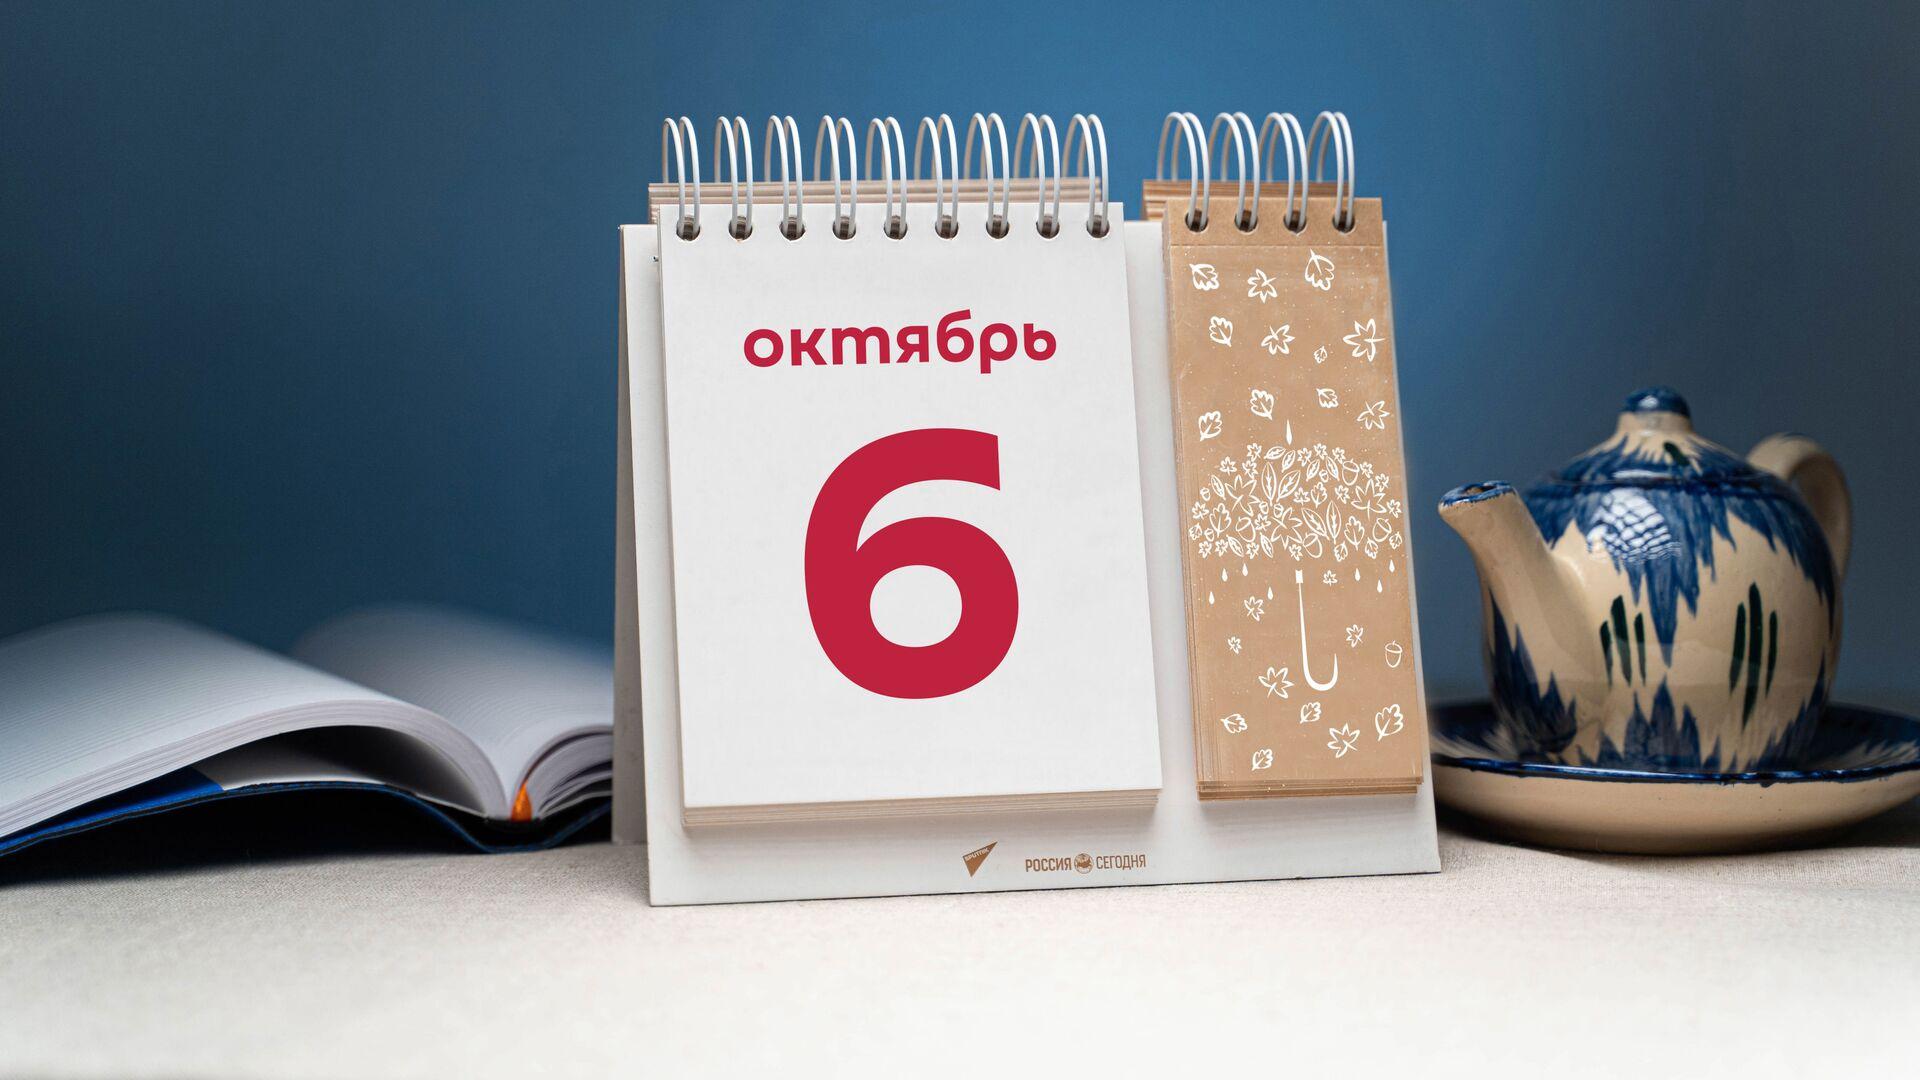 День 6 октября - Sputnik Тоҷикистон, 1920, 06.10.2021